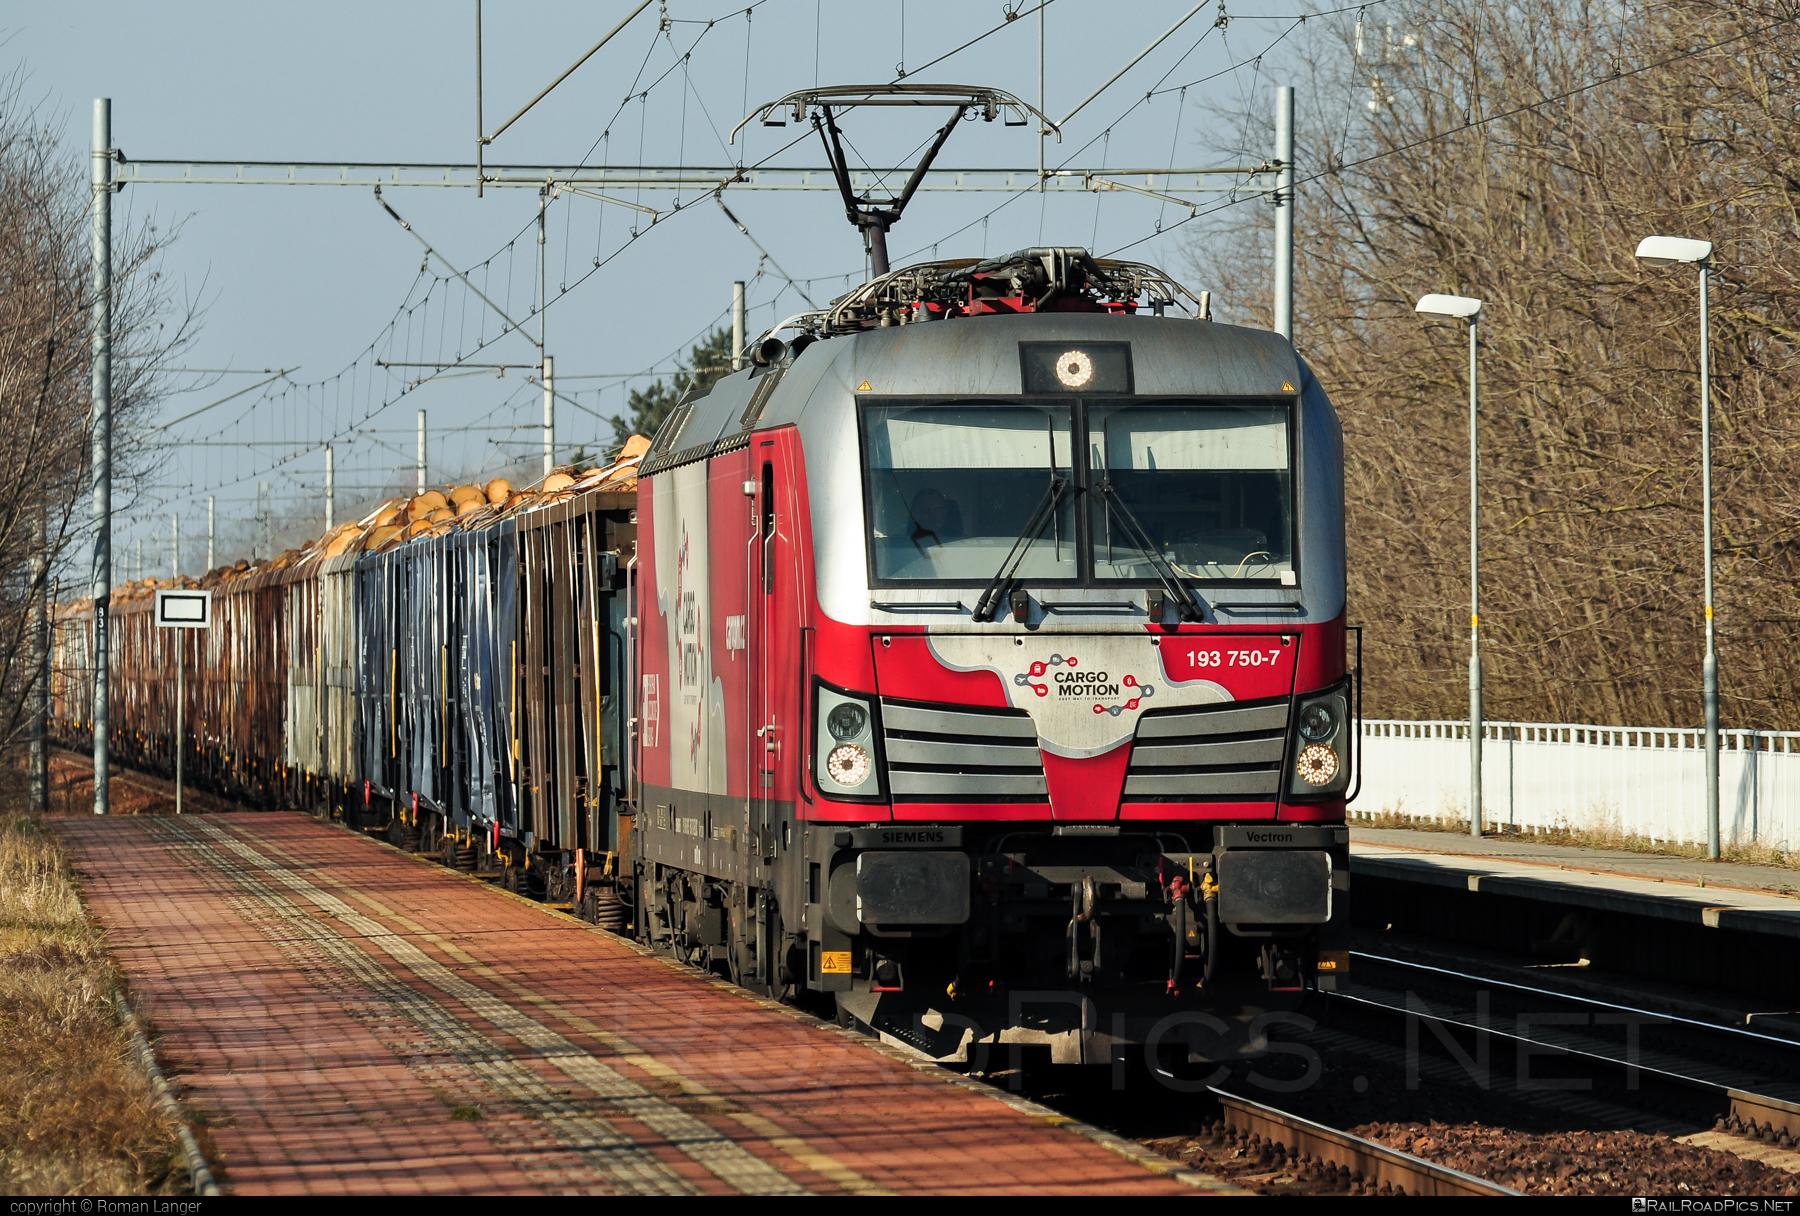 Siemens Vectron MS - 193 750-7 operated by Cargo Motion s.r.o. #CargoMotion #CargoMotionAS #ell #ellgermany #eloc #europeanlocomotiveleasing #siemens #siemensvectron #siemensvectronms #vectron #vectronms